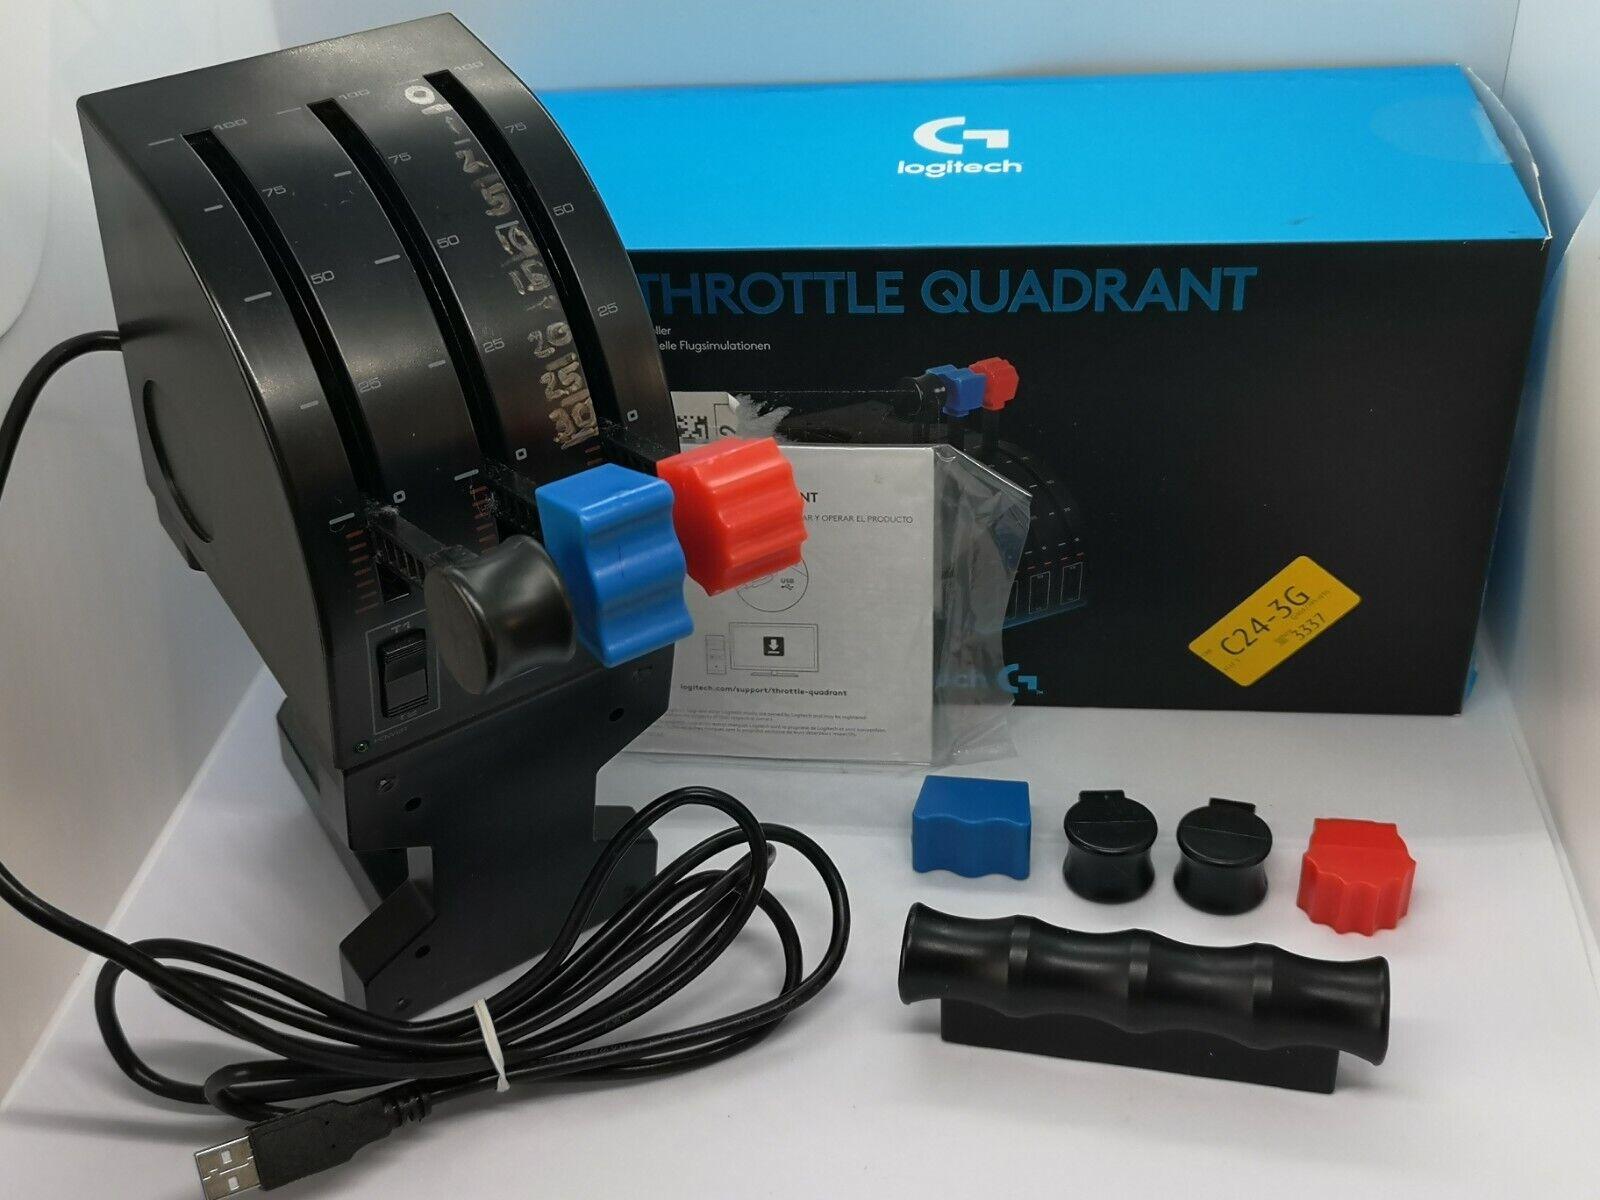 Logitech 945-000015 Flight Throttle Quadrant Professional Simulation Axis Lever